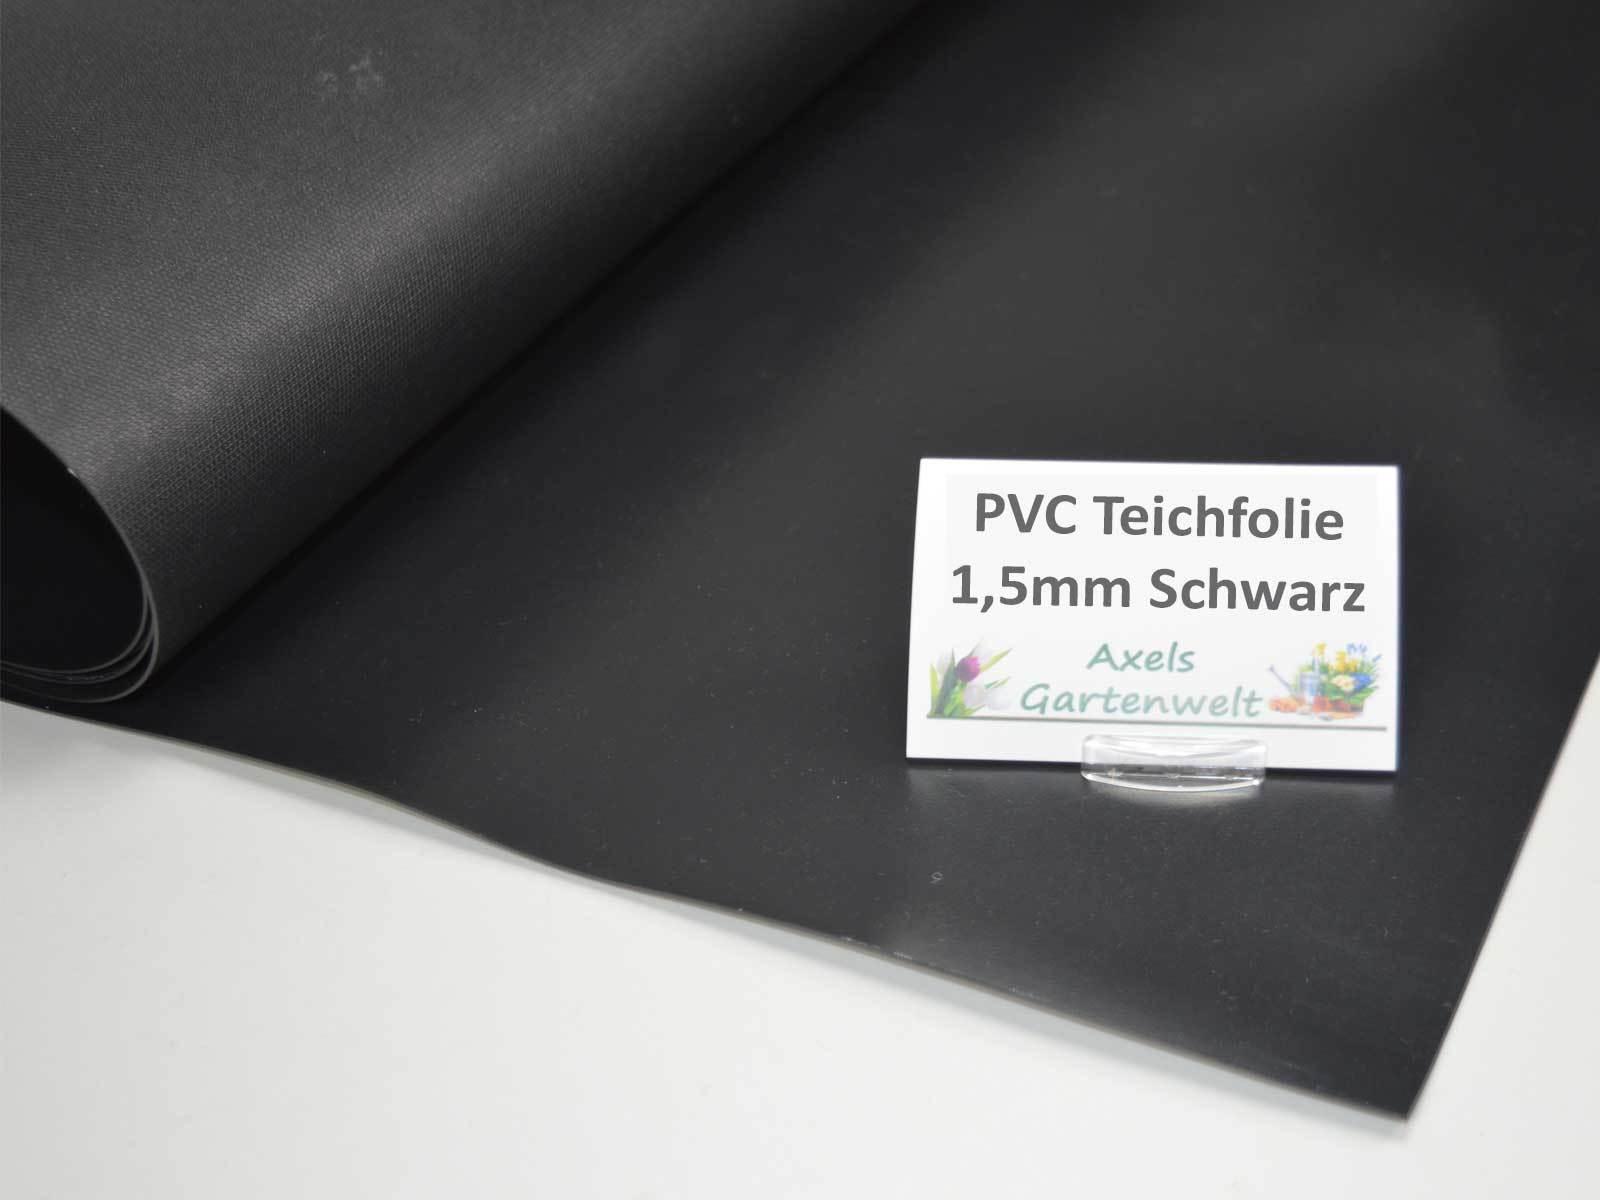 m² Teichfolie Schwarz 1,5mm Profi 10x9 m Teich Folie Gartenteichfolie 9x10